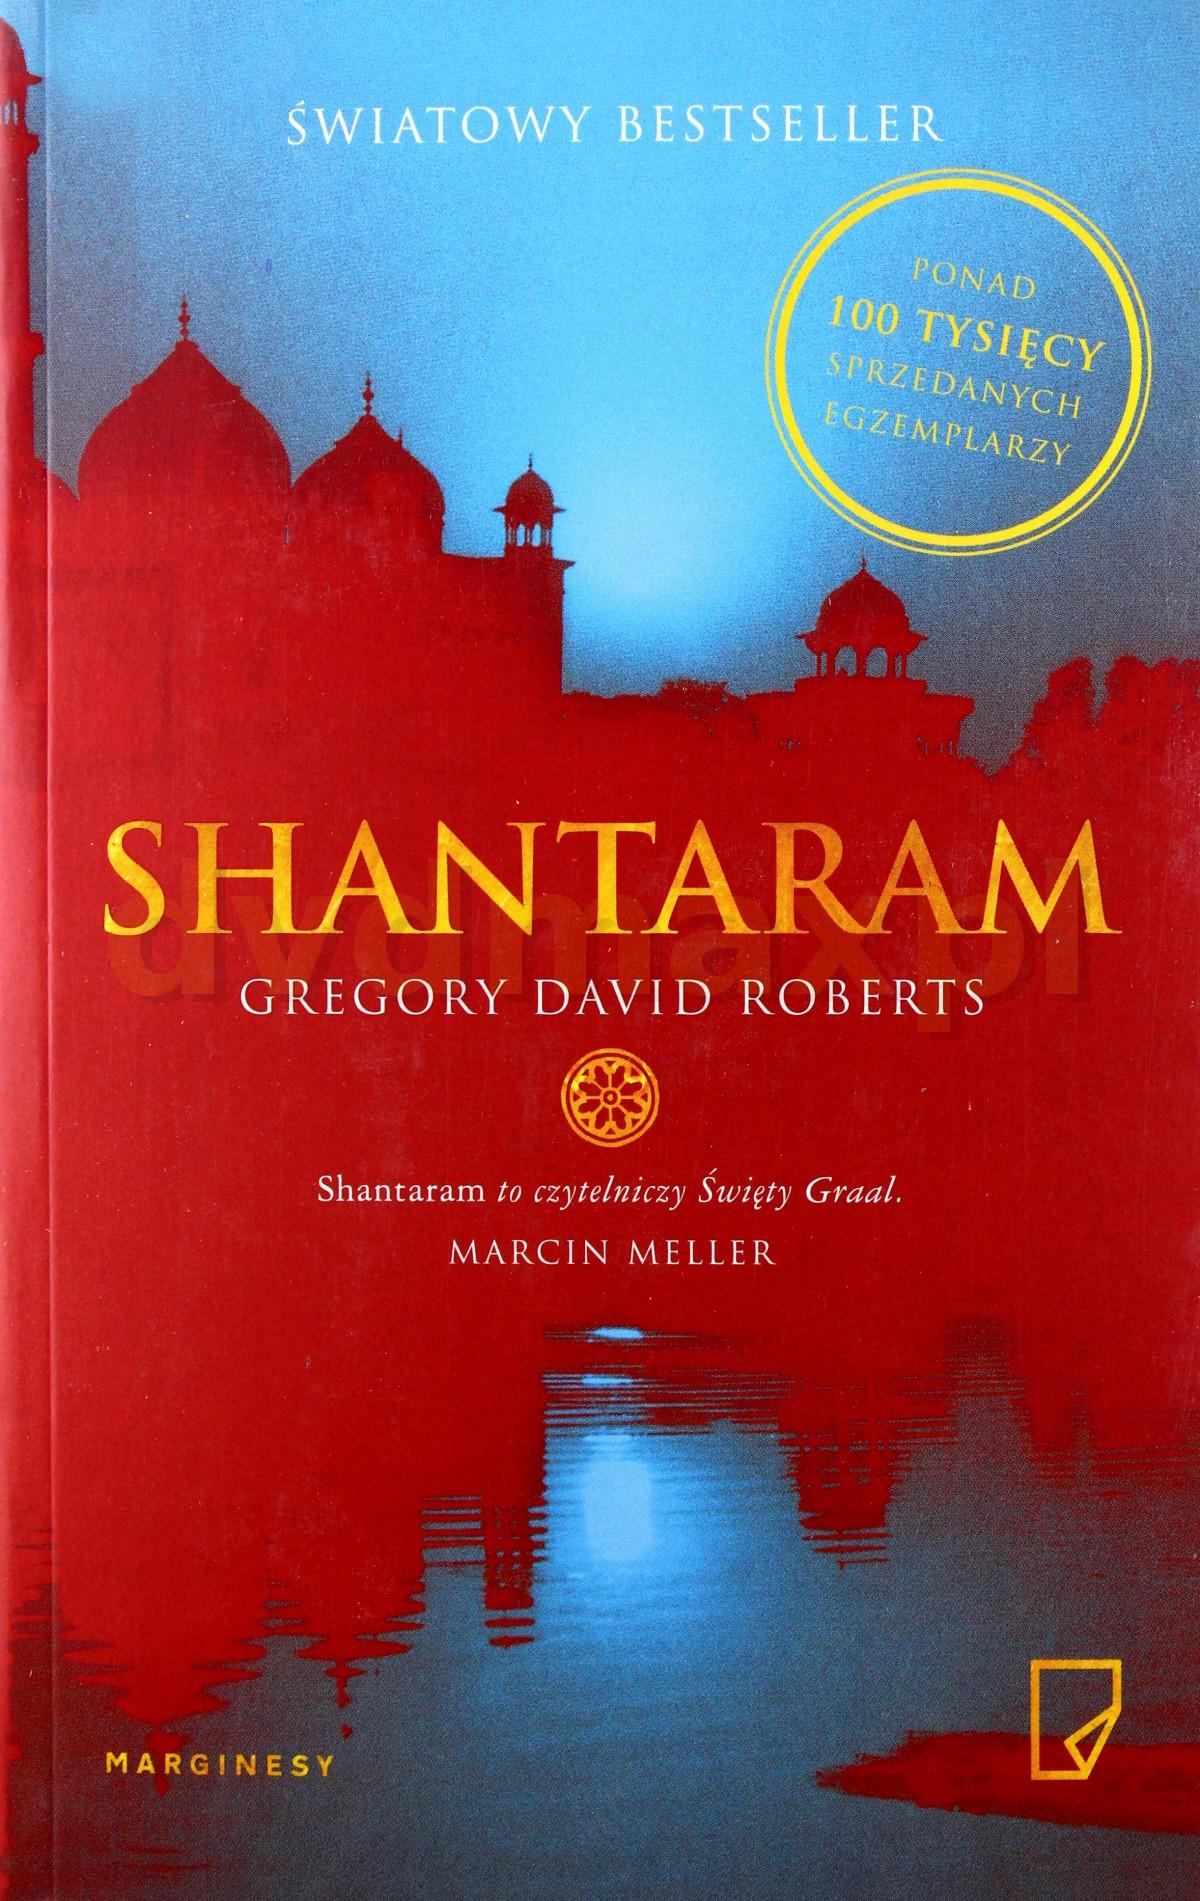 Shantaram - Gregory David Roberts [KSIĄŻKA] - Gregory David Roberts